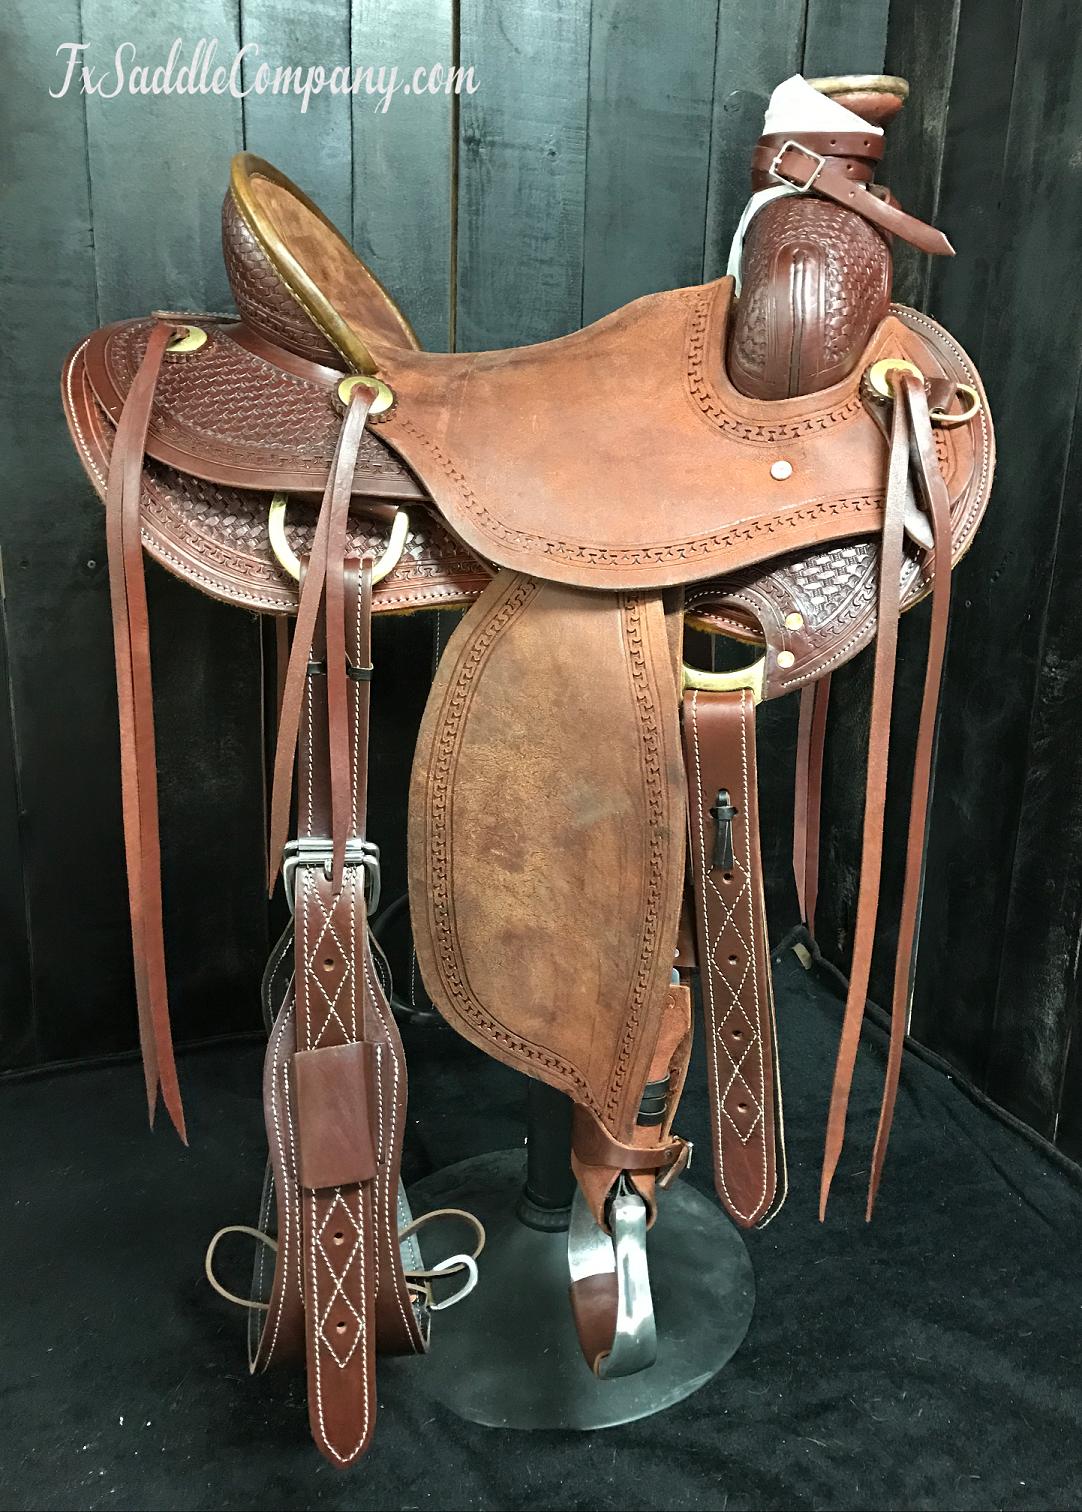 Custom Association Roping Saddle - Ranch/Wade/Training